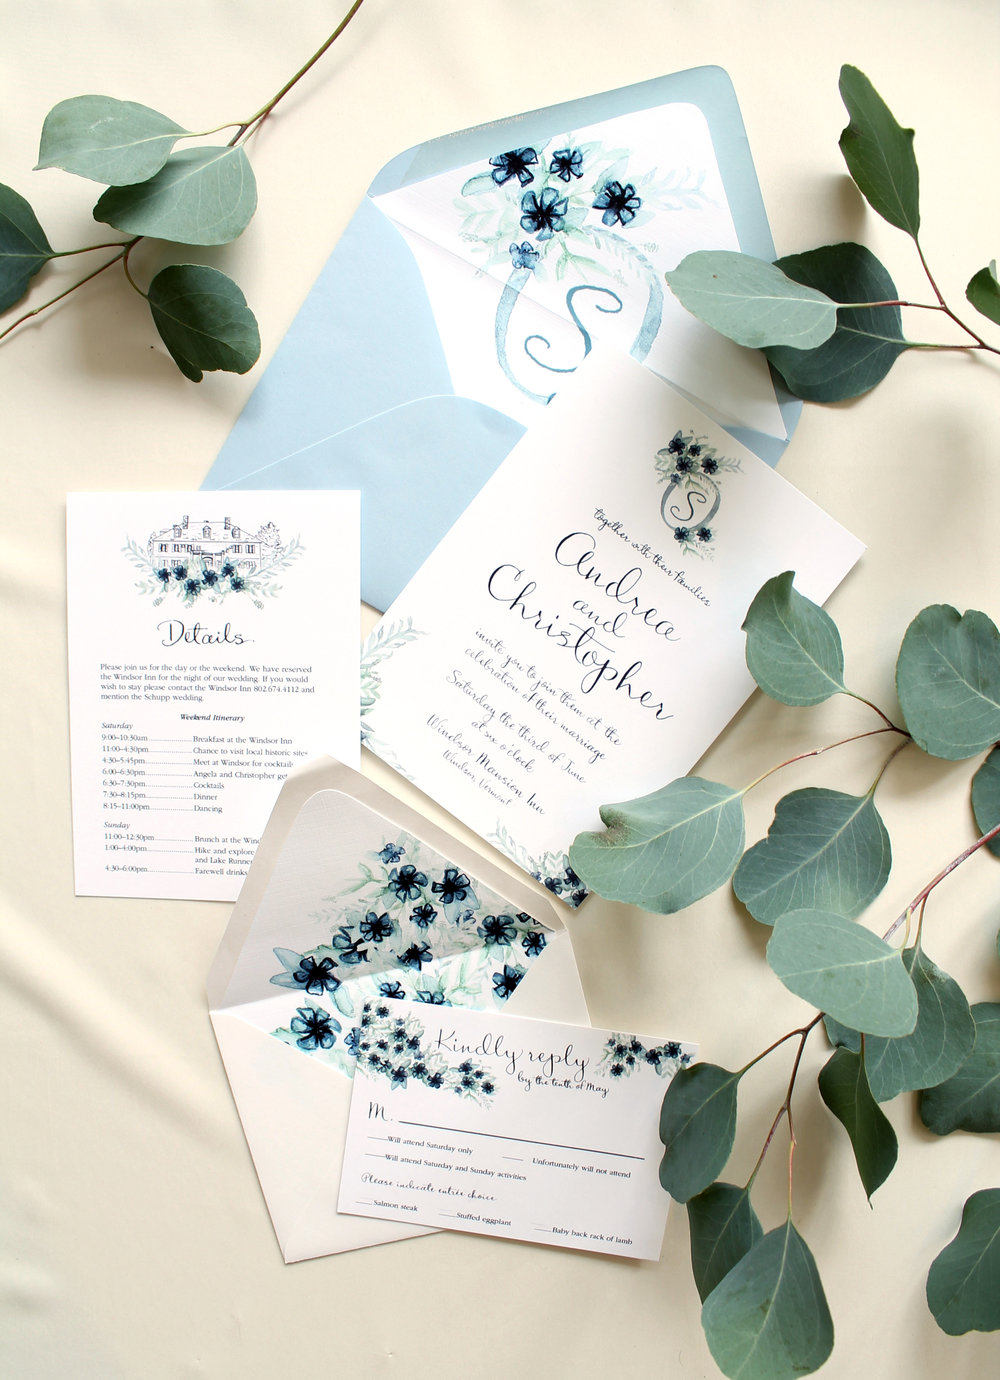 Blush and Blue Designs - Vermont custom wedding invitations, blue wedding invitations